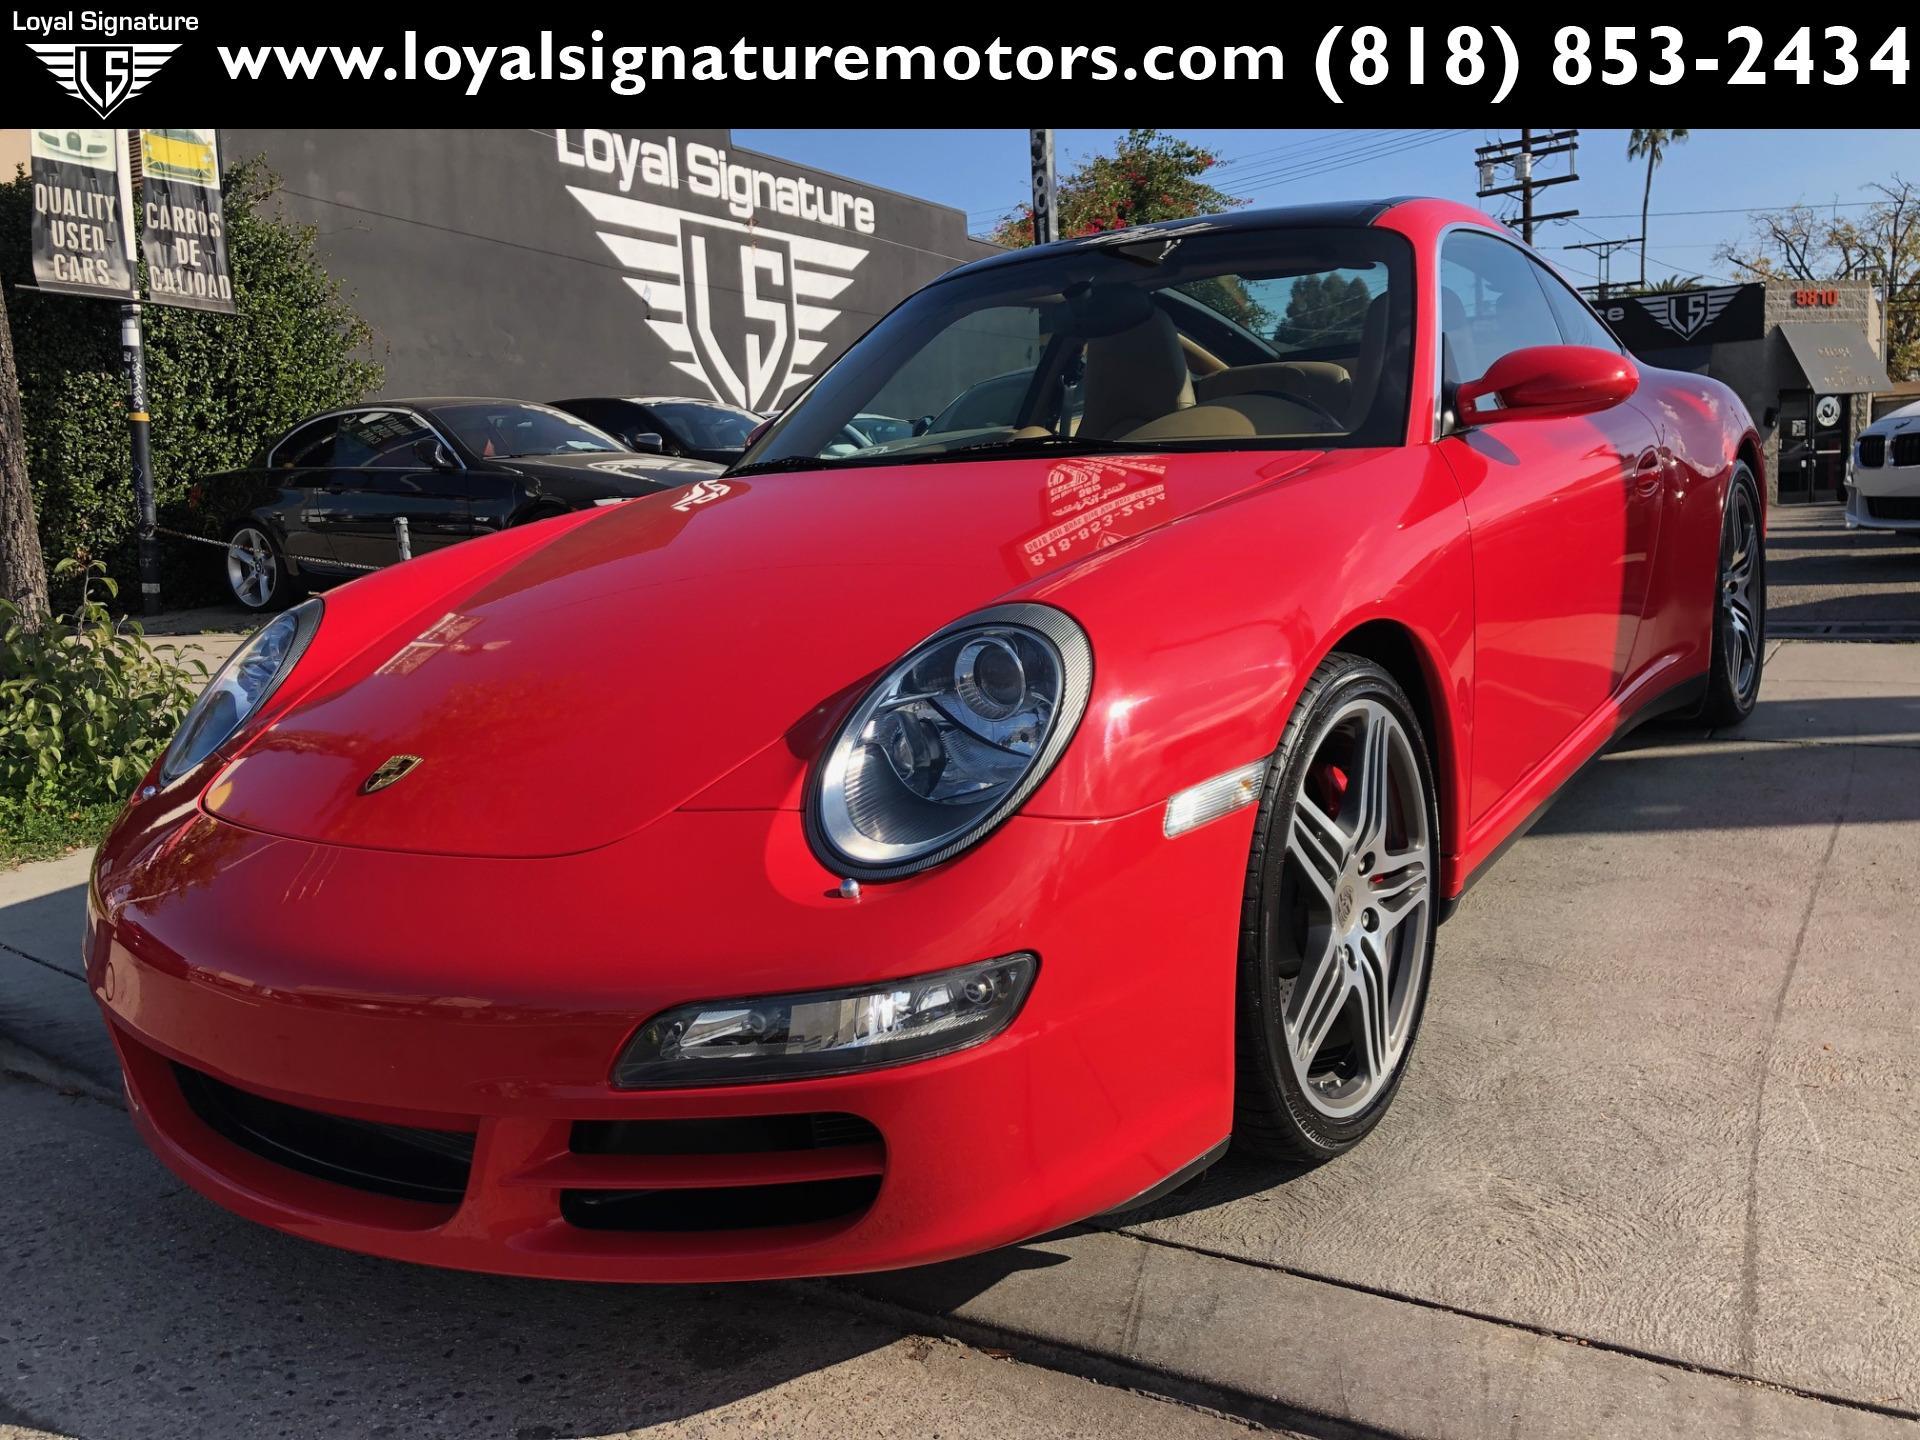 Used-2008-Porsche-911-Targa-4S